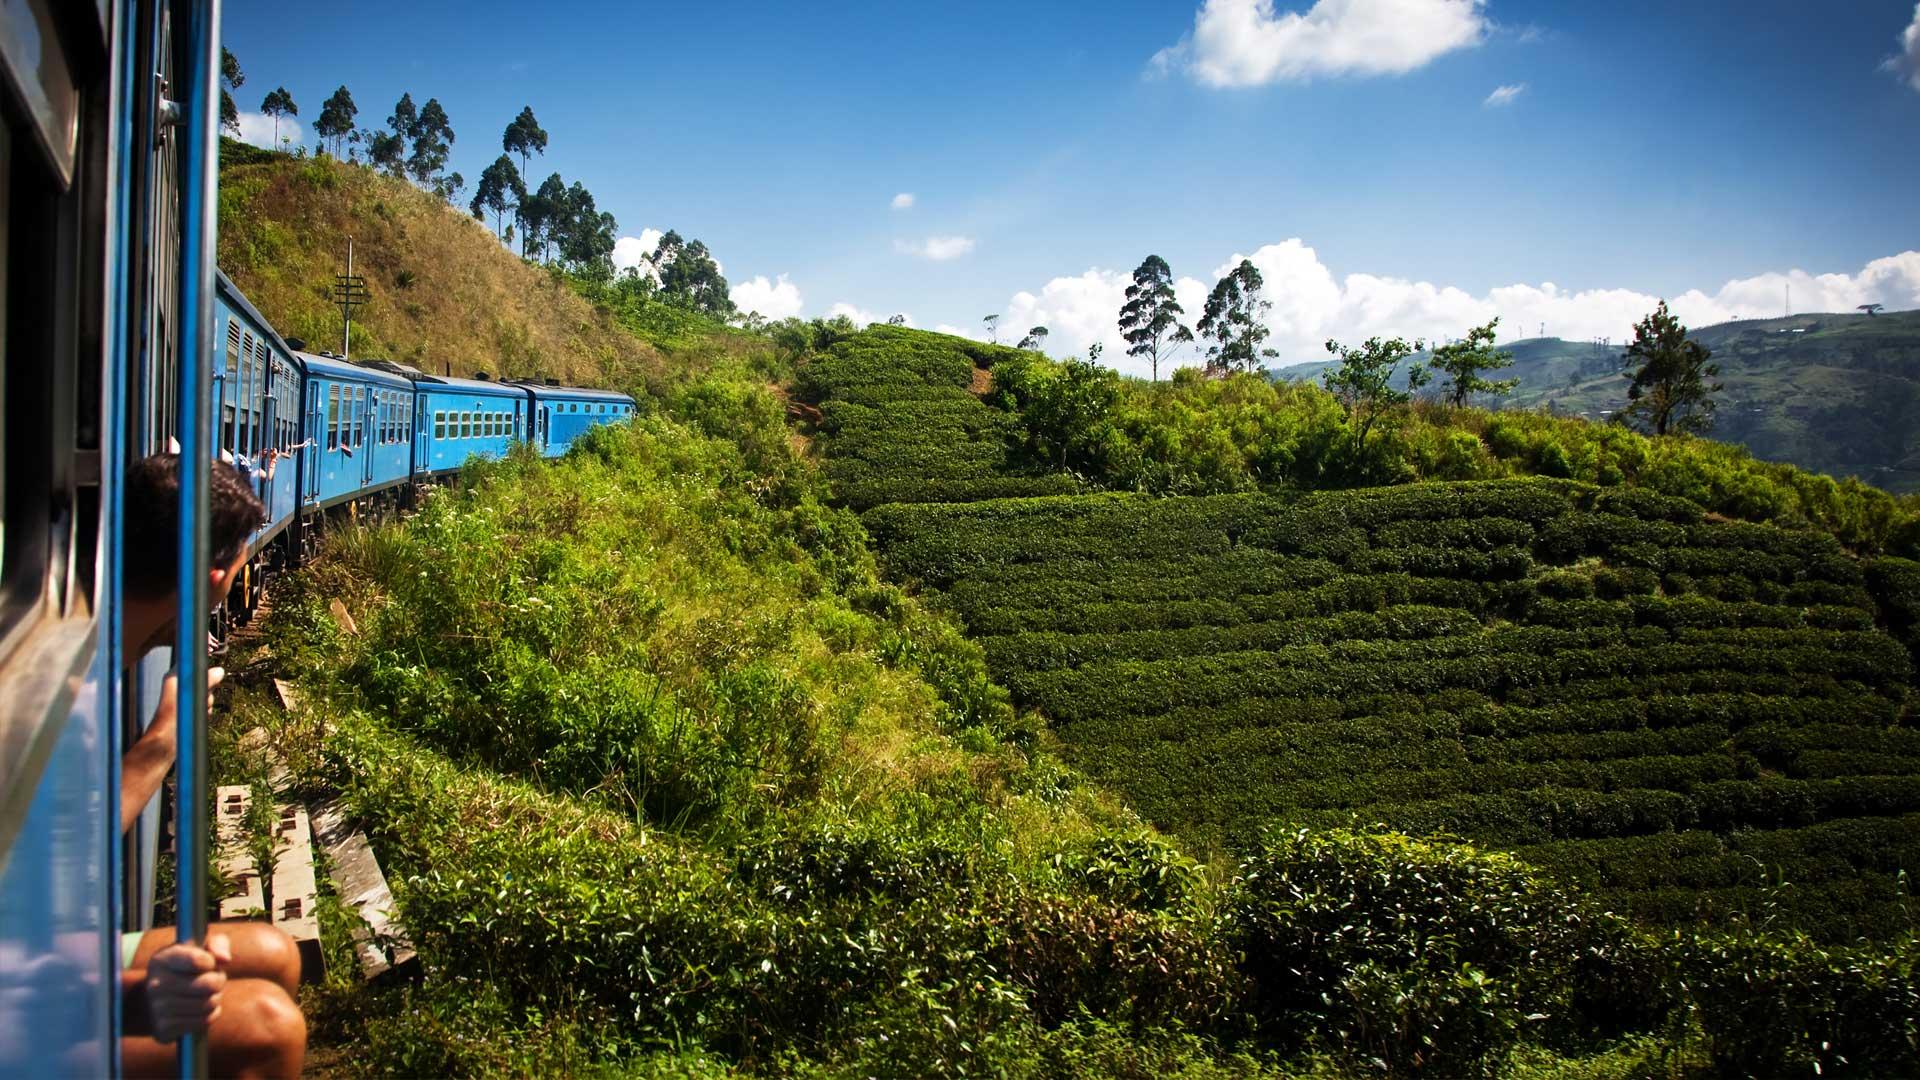 Train-from-Nuwara-Eliya-to-Kandy